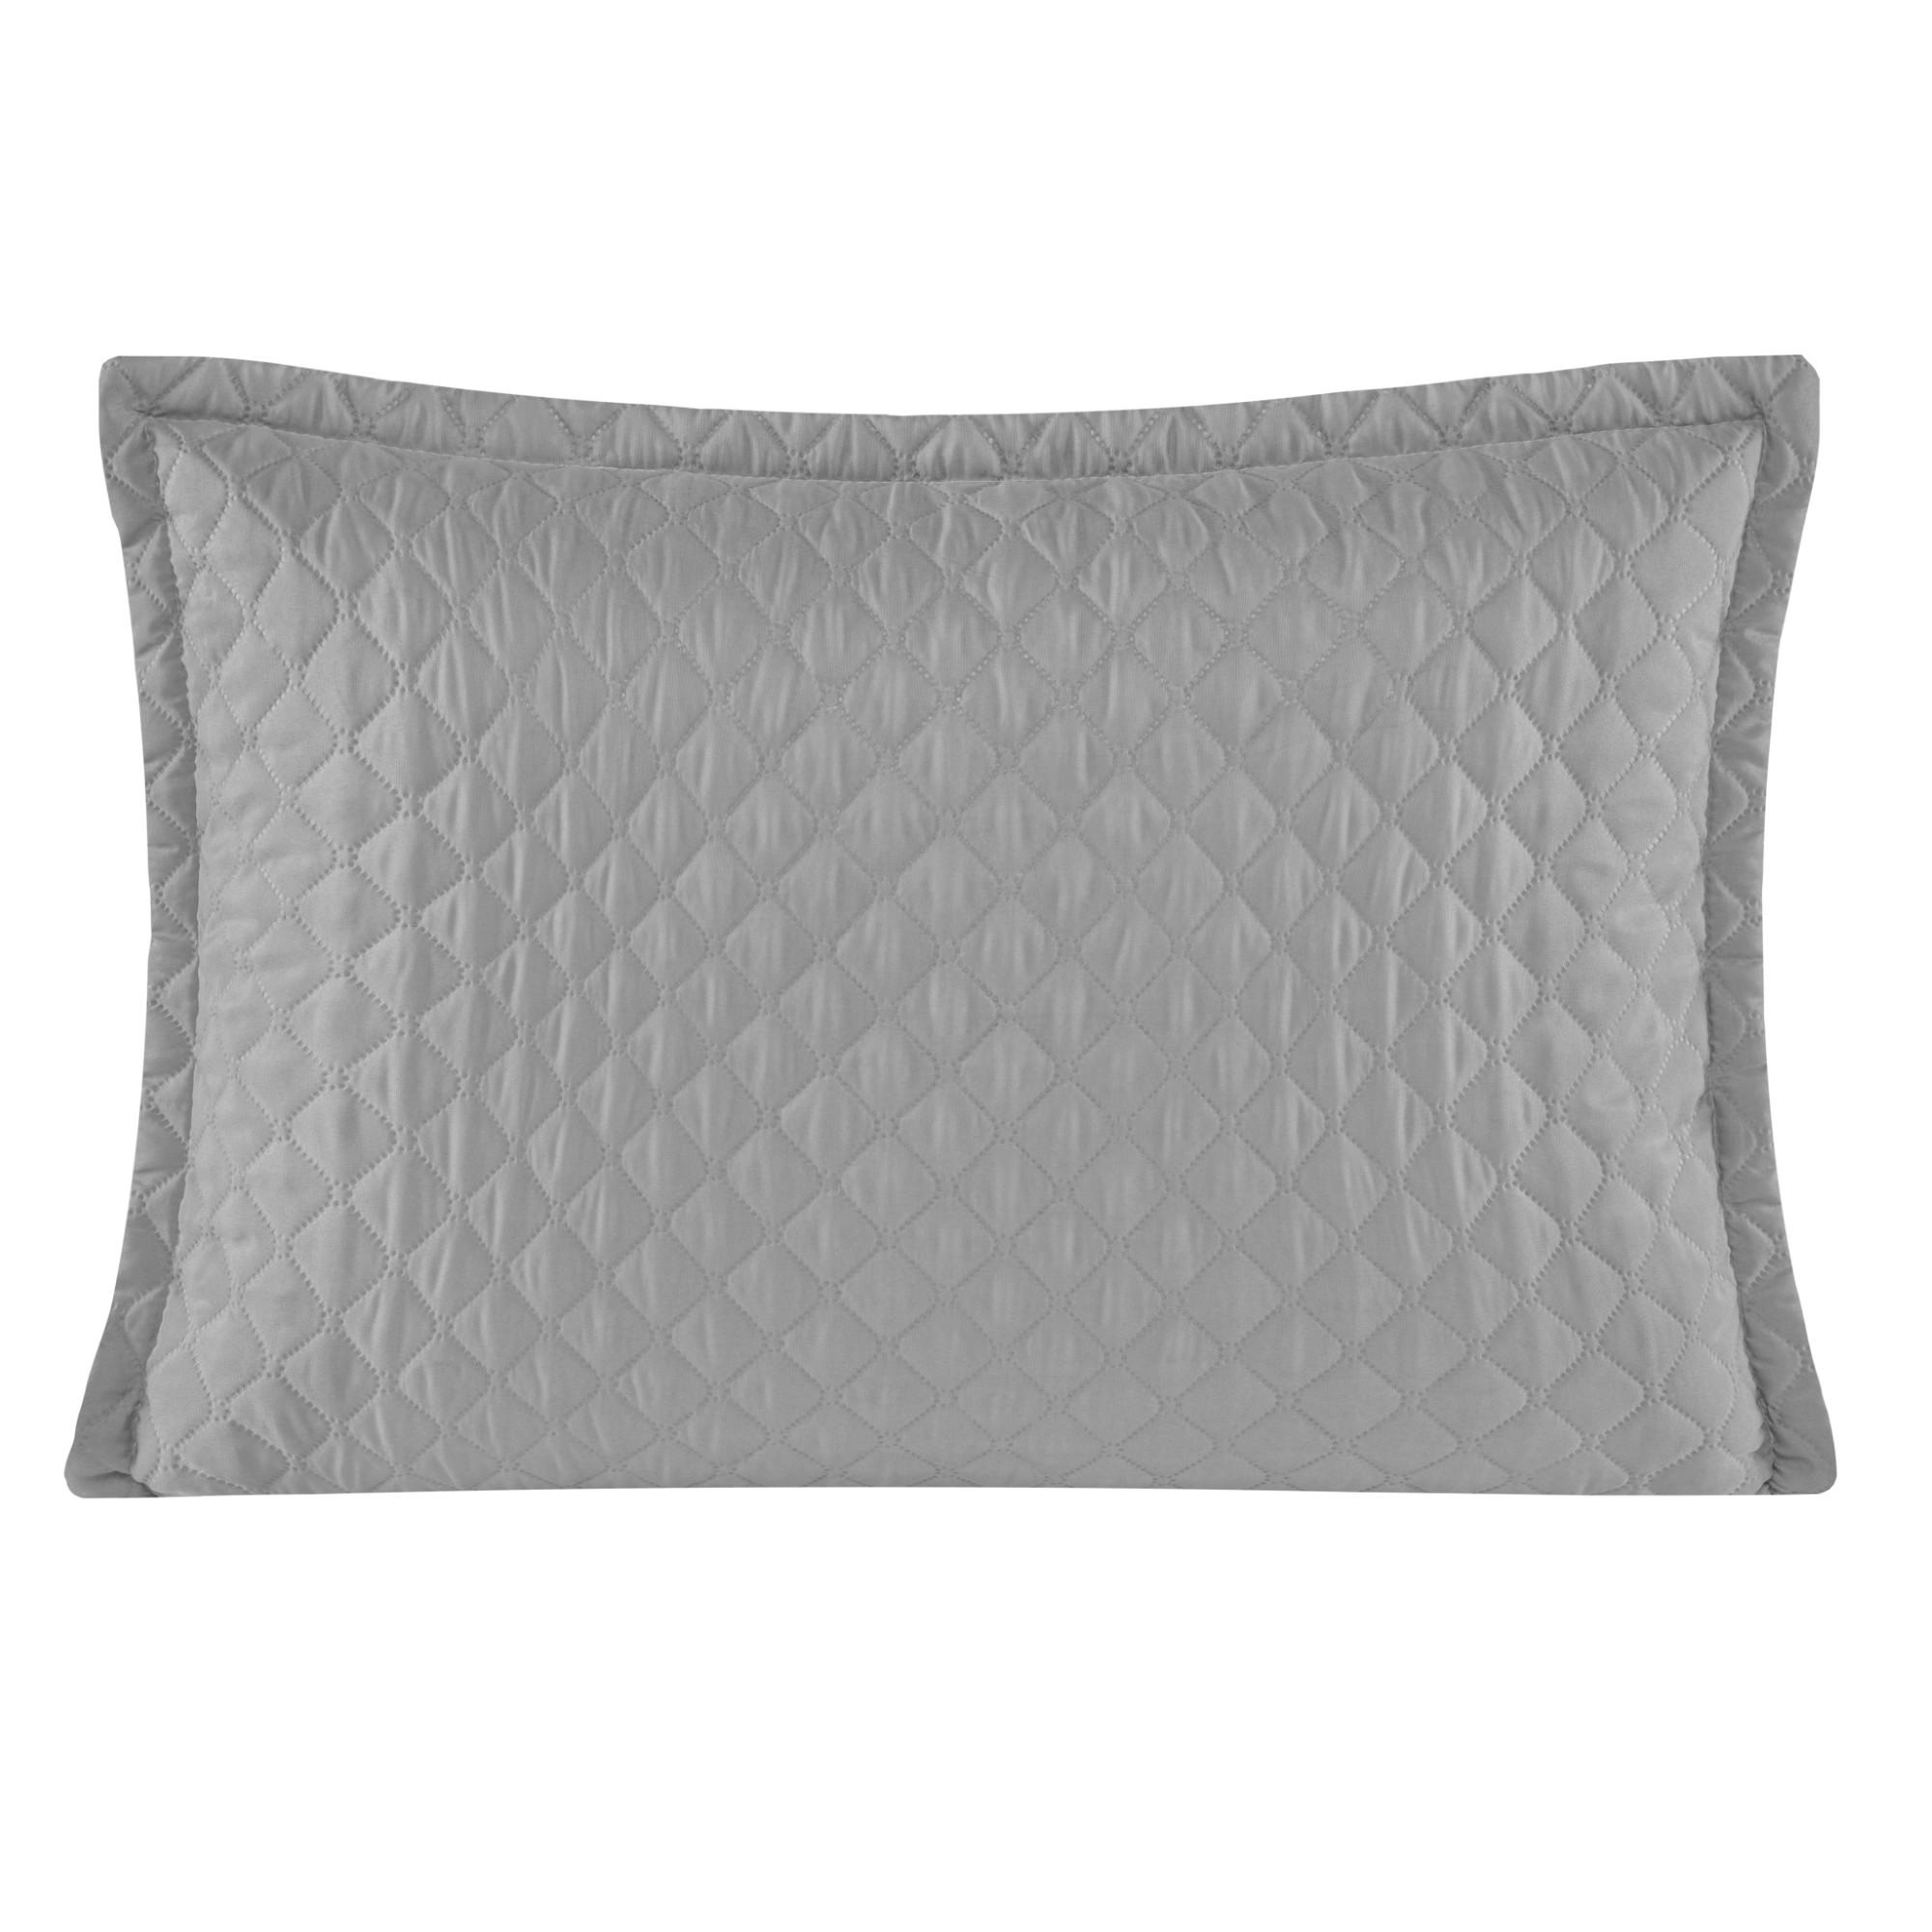 Porta Travesseiro 50 x 70 cm Delicata Cinza - Yohana